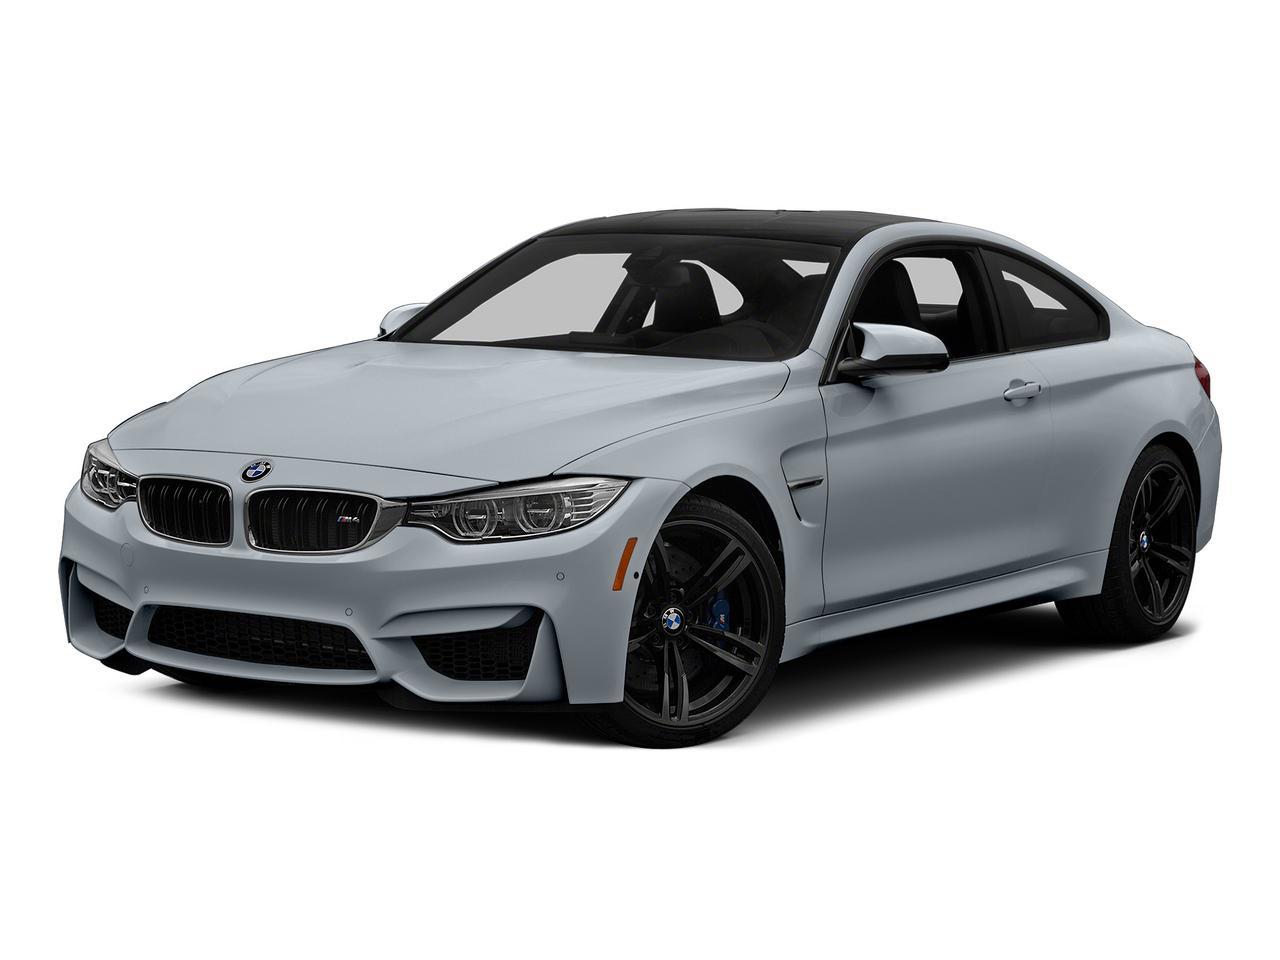 2015 BMW M4 Vehicle Photo in PORTLAND, OR 97225-3518